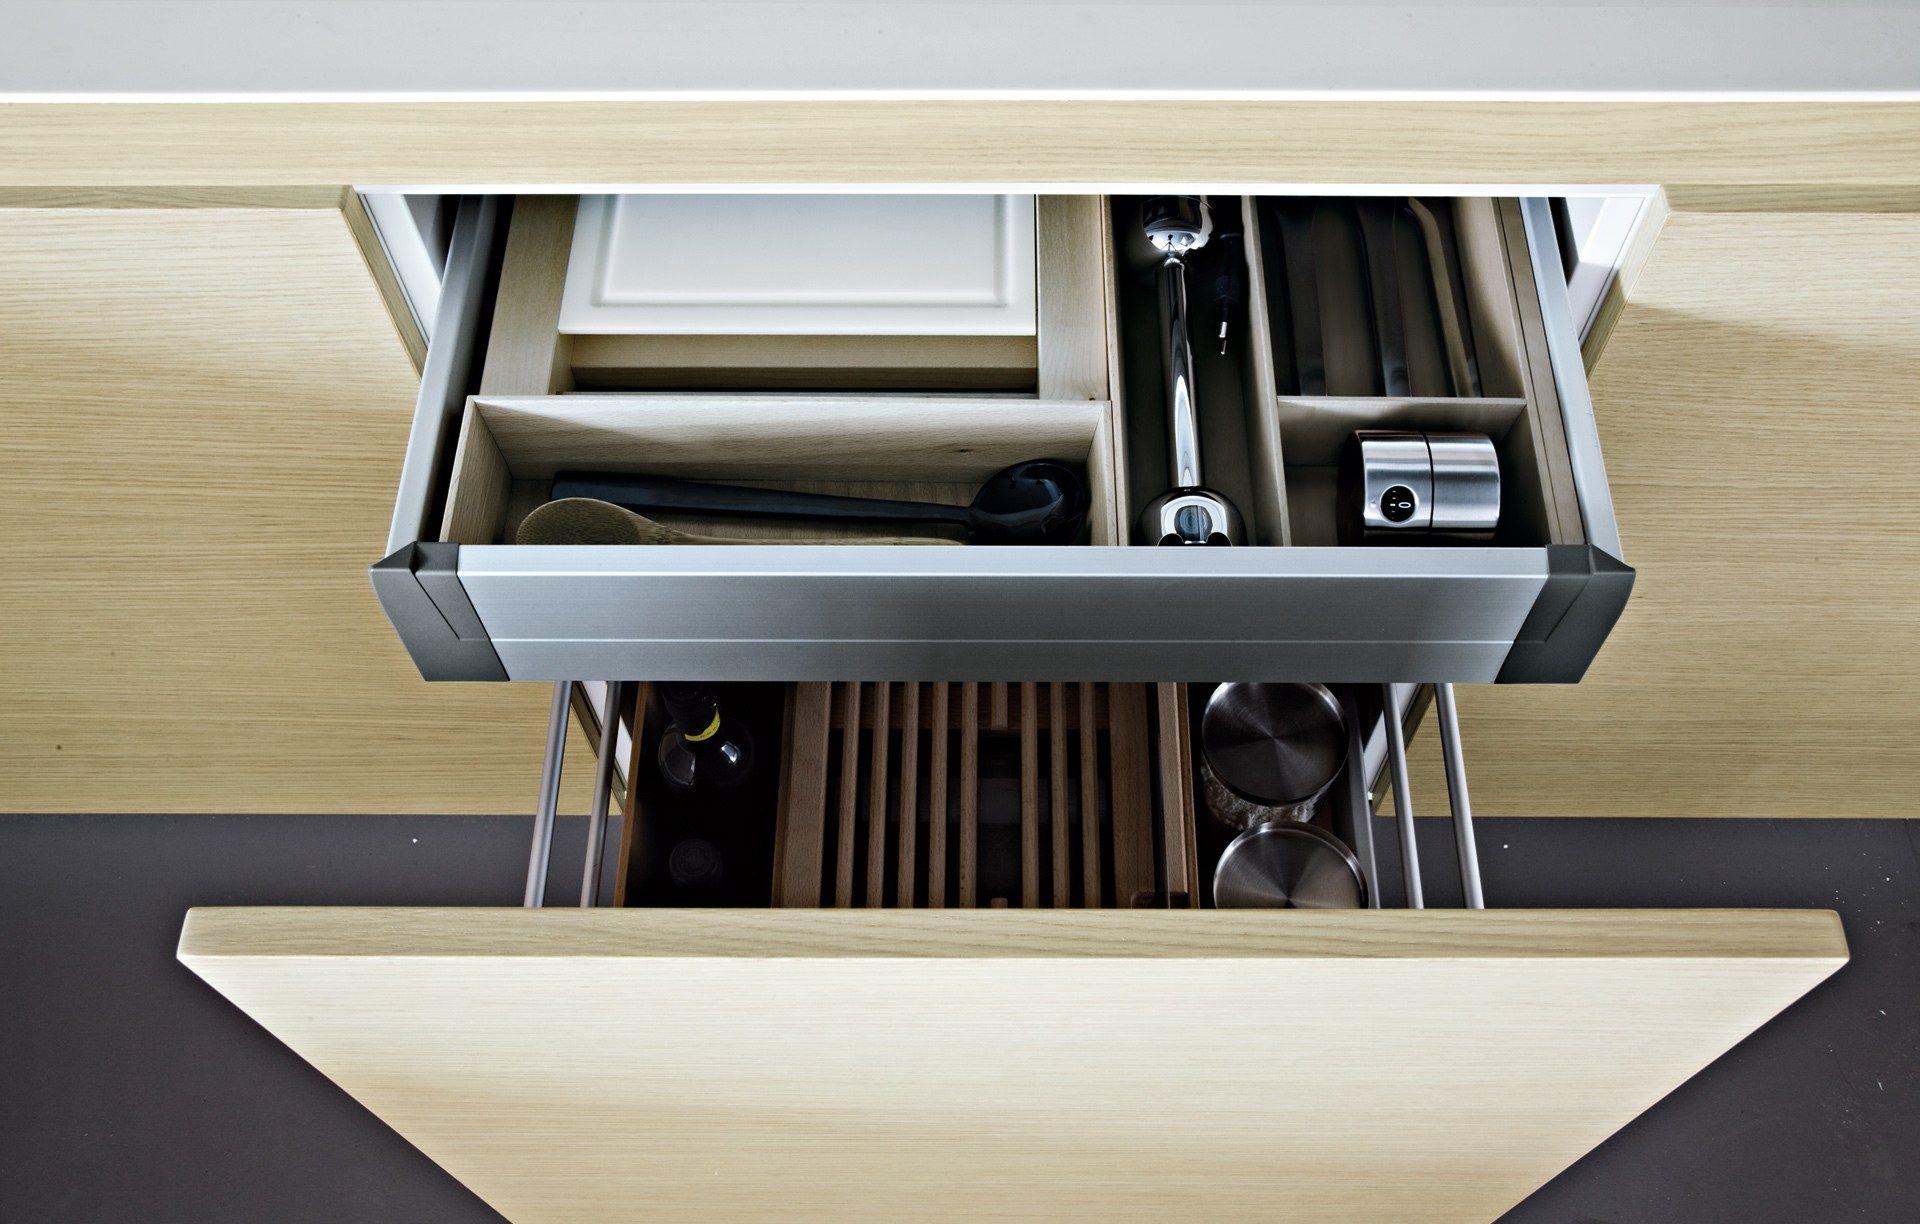 Lacquered Wooden Kitchen ALEA By Varenna Poliform Design Paolo Piva